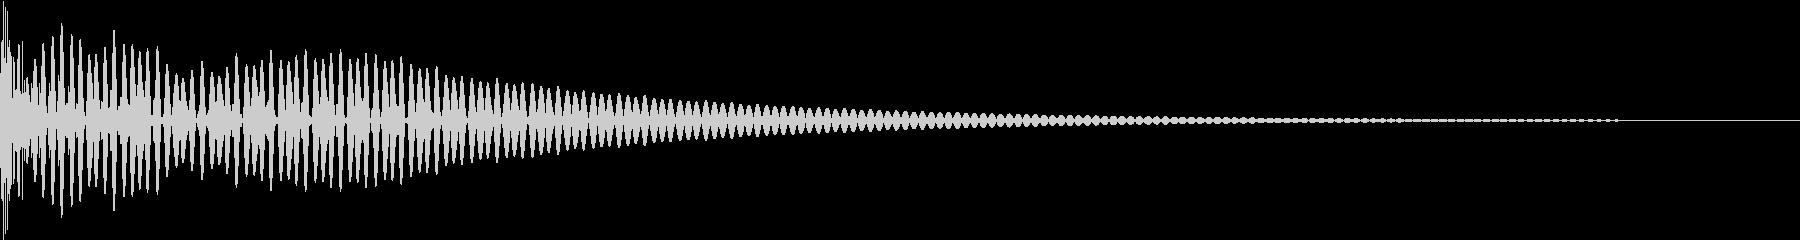 DTM Tom 12 オリジナル音源の未再生の波形